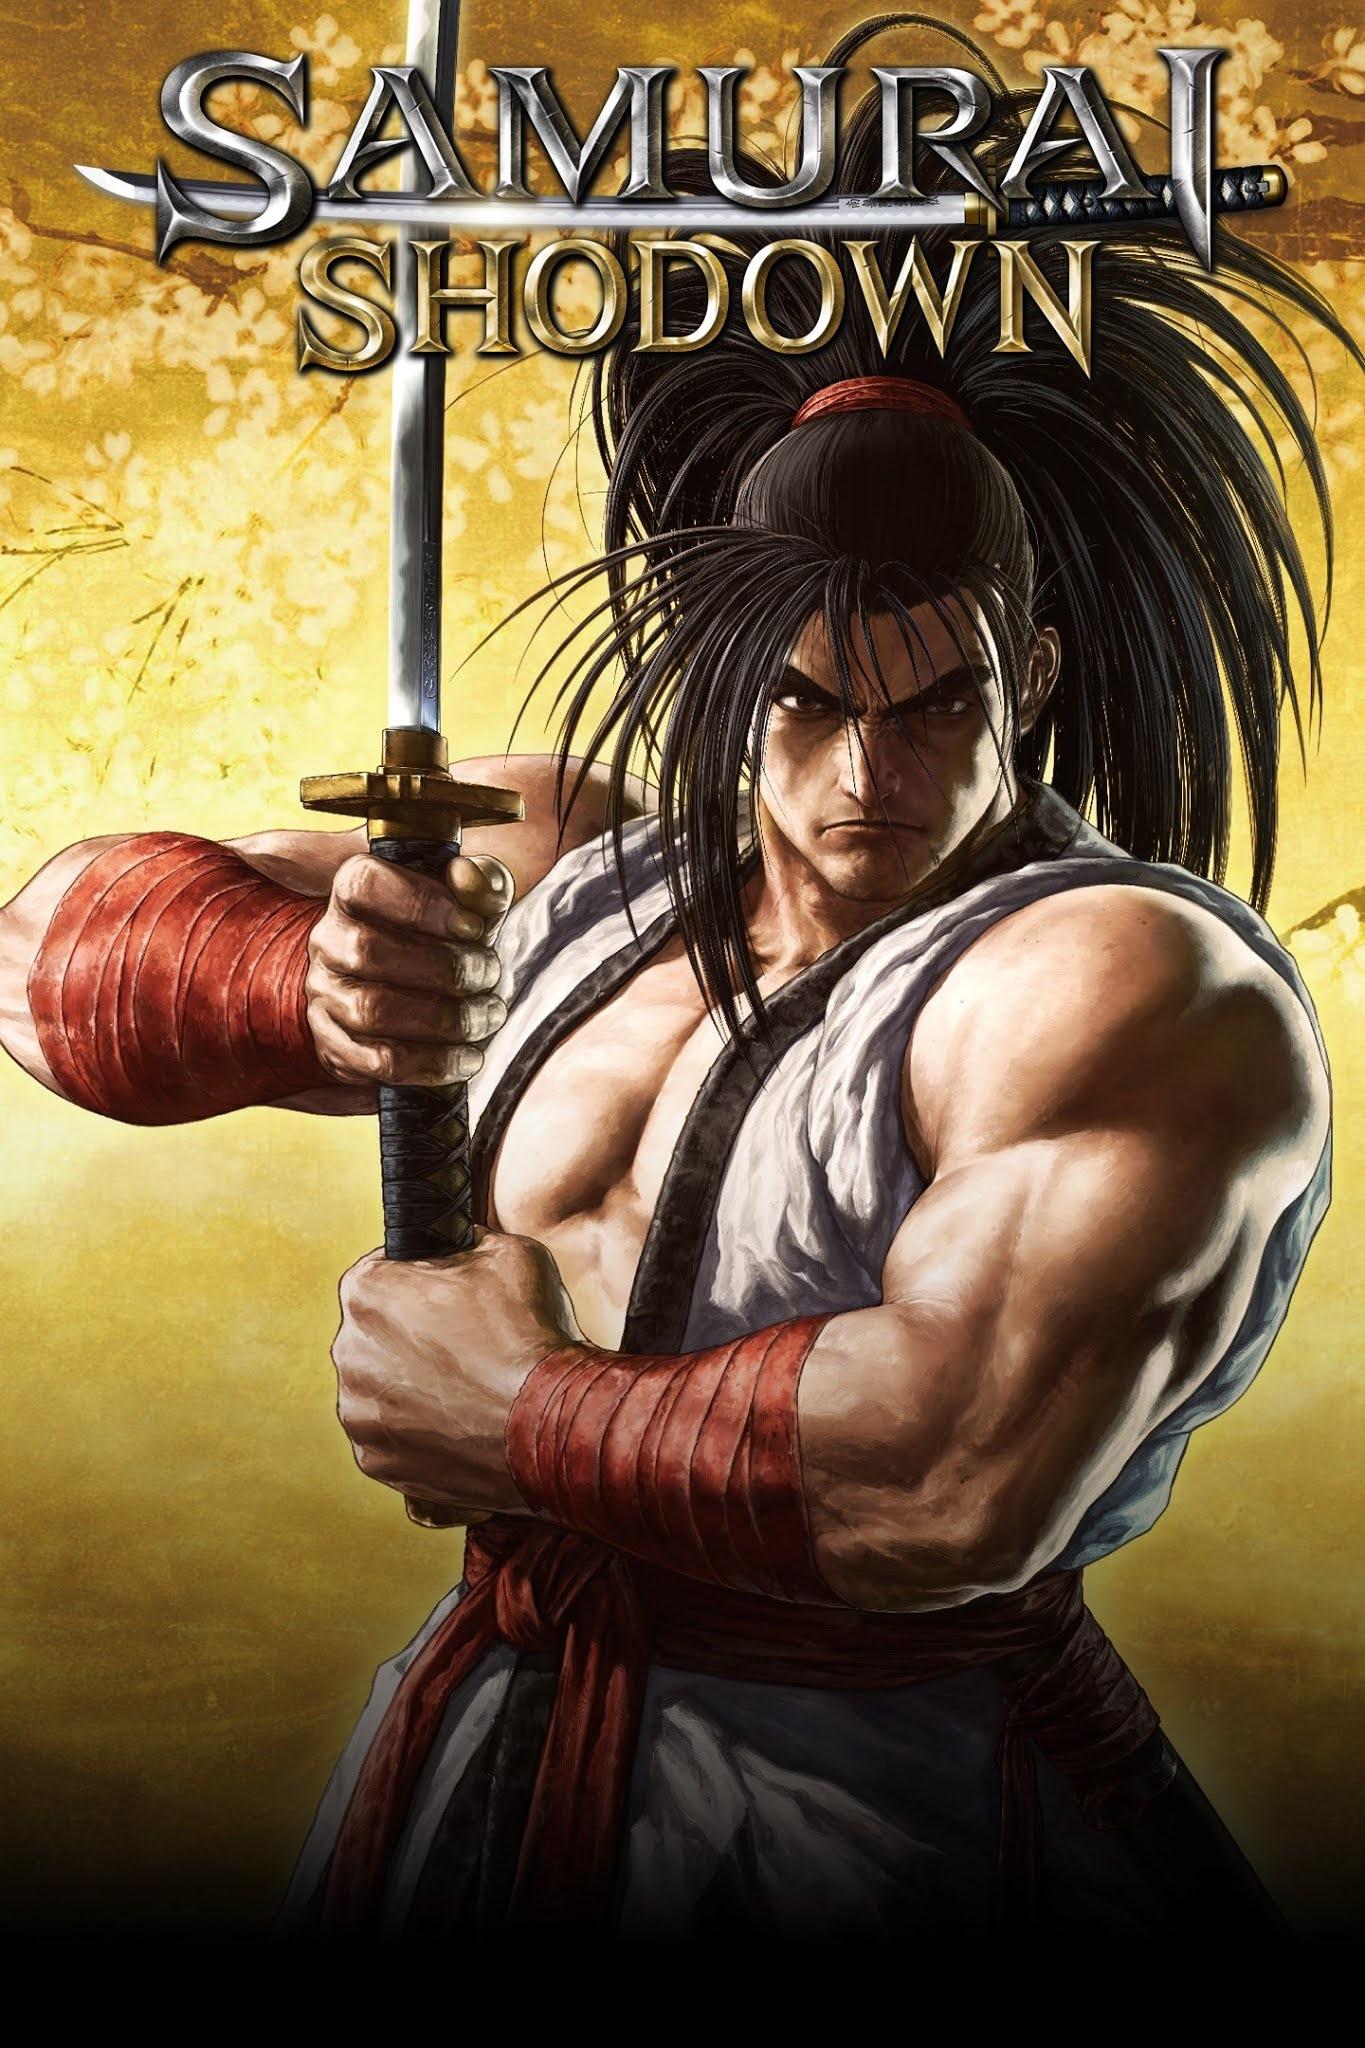 Baixar: SAMURAI SHODOWN Torrent (PC)